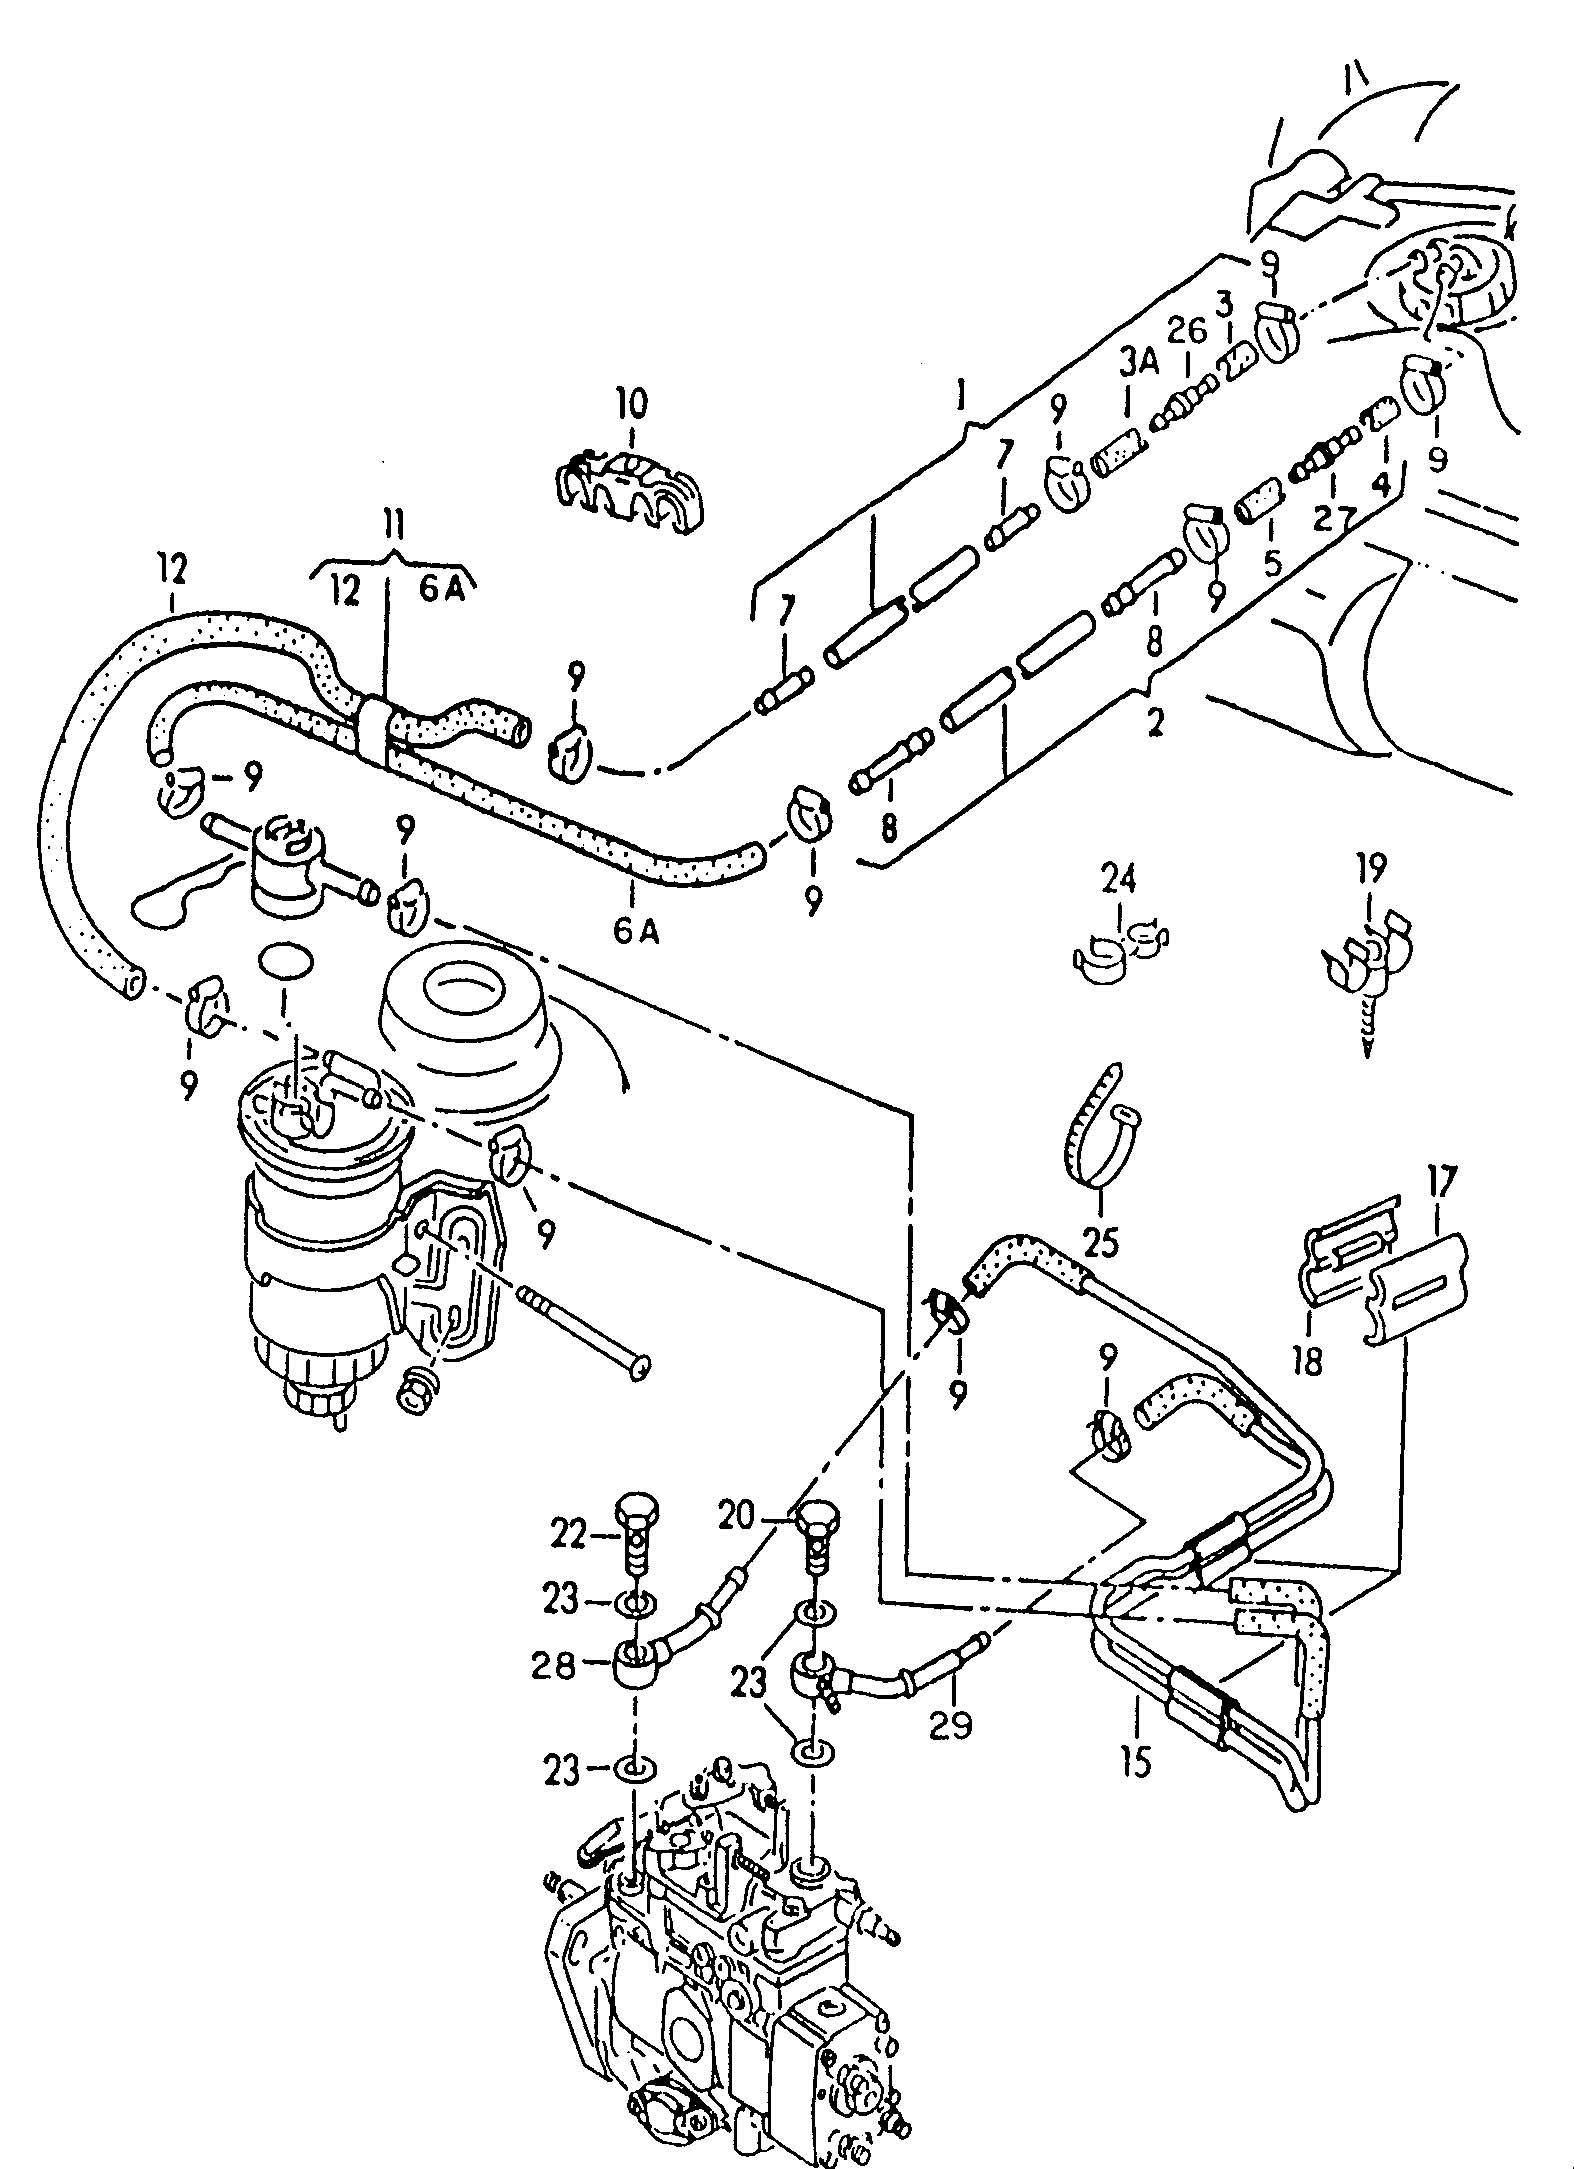 Volkswagen W8 Engine Diagram Volkswagen Auto Wiring Diagram